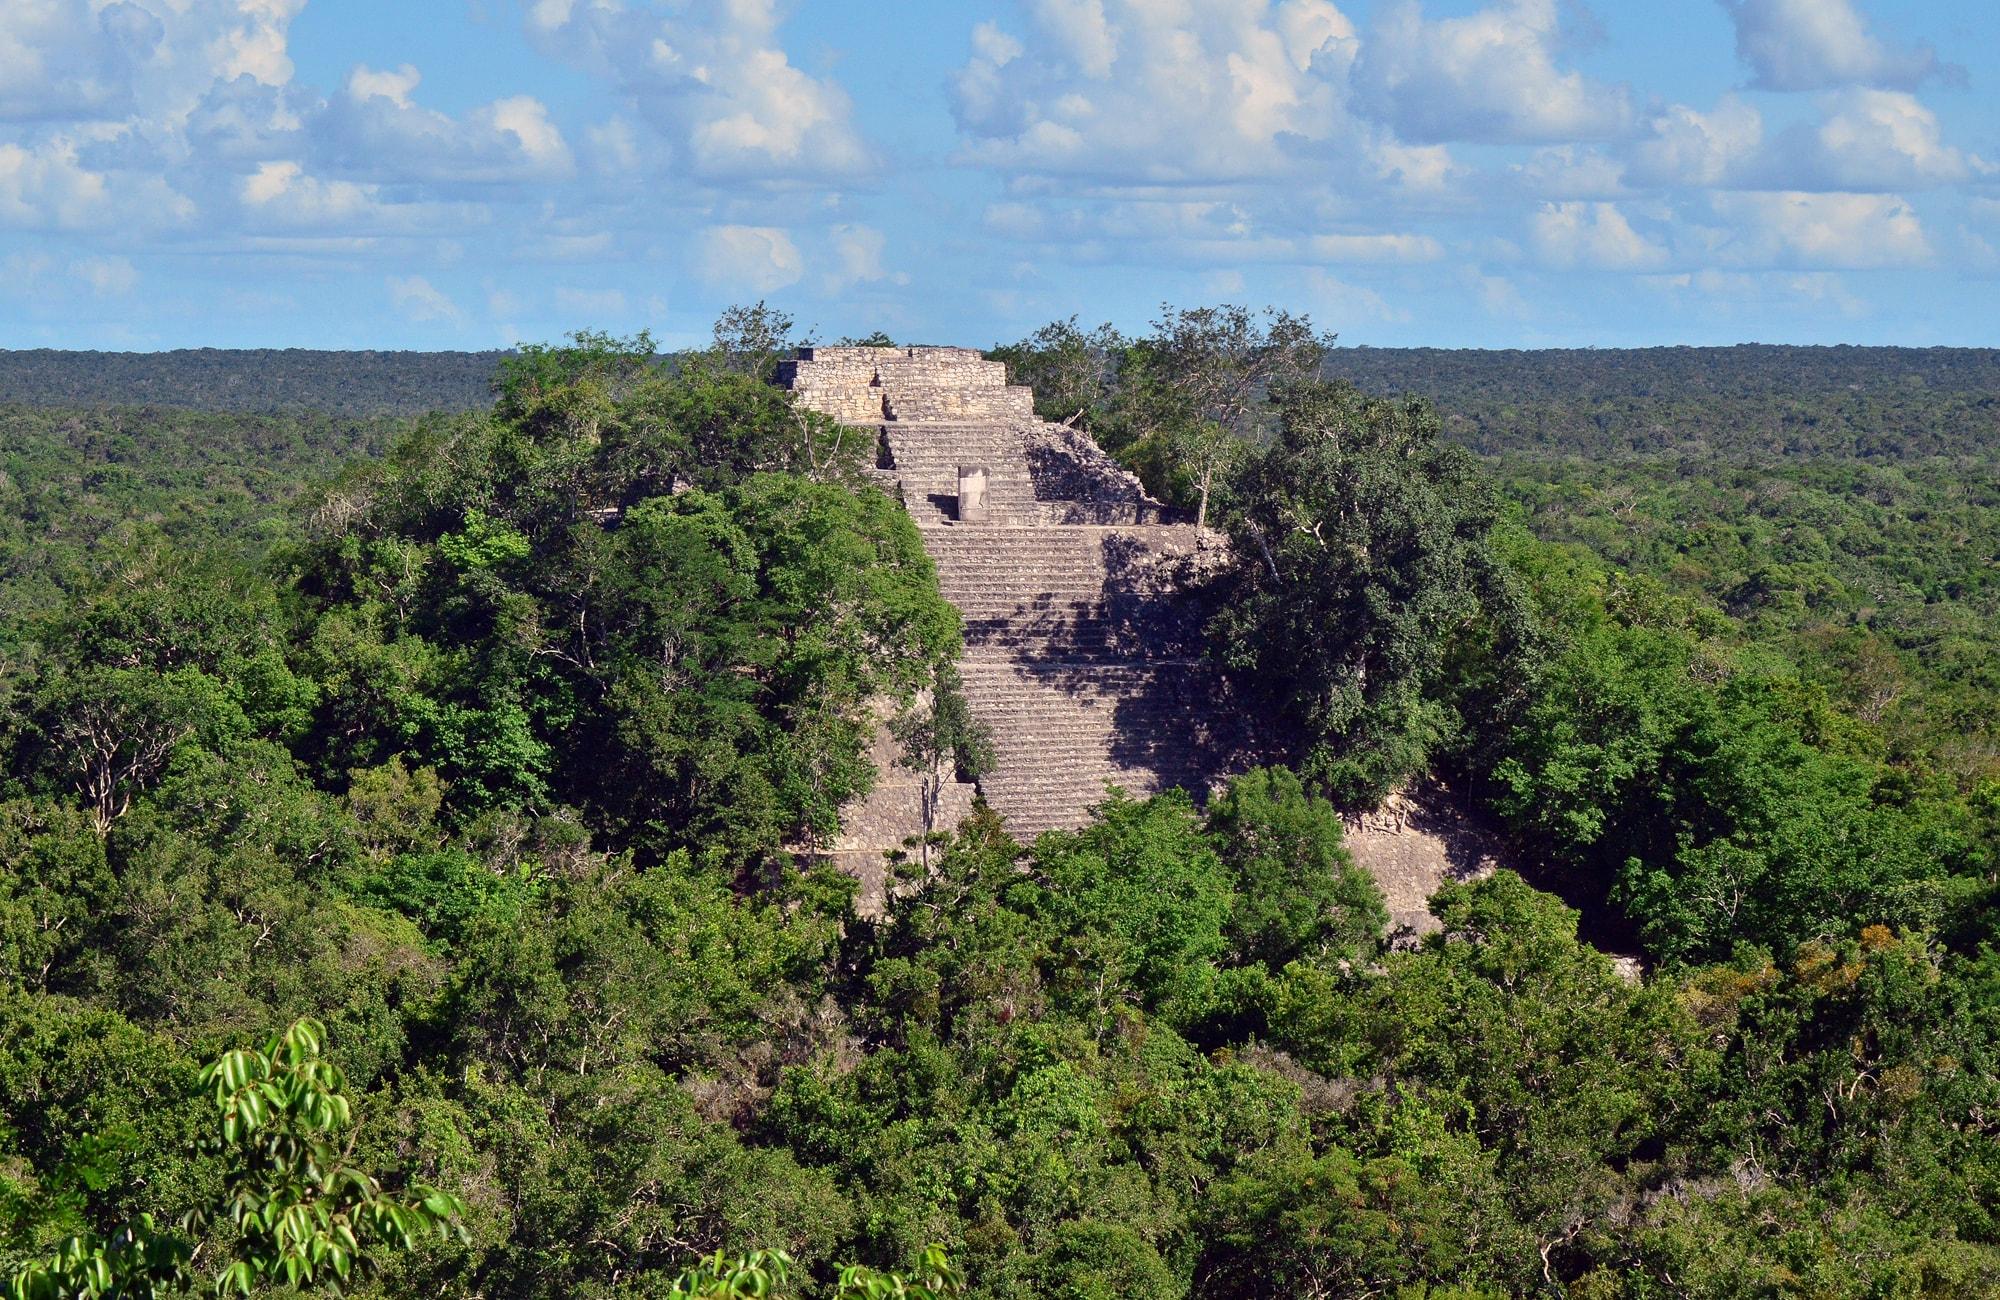 Mexique-Pyramide-Calamuk-Amplitudes